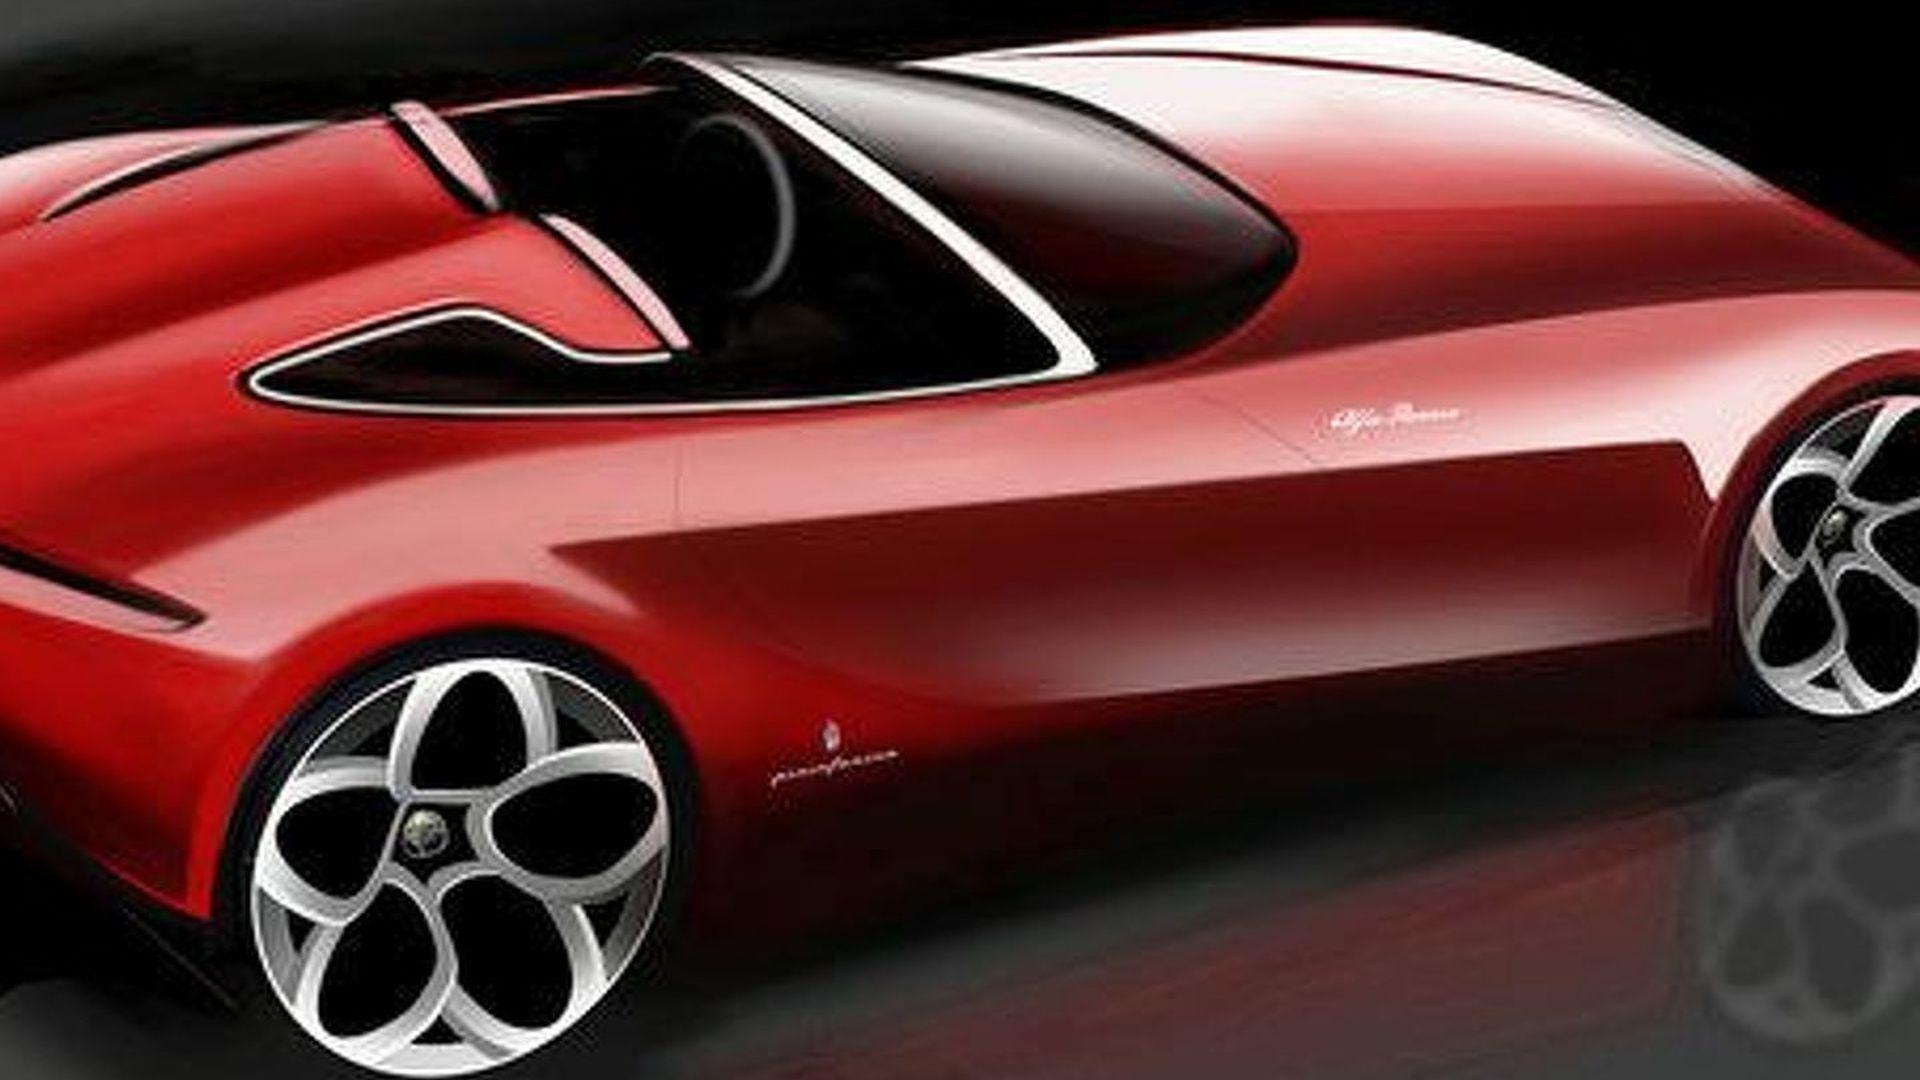 Pininfarina Releases Second Alfa Romeo Spider Concept Teaser Sketch